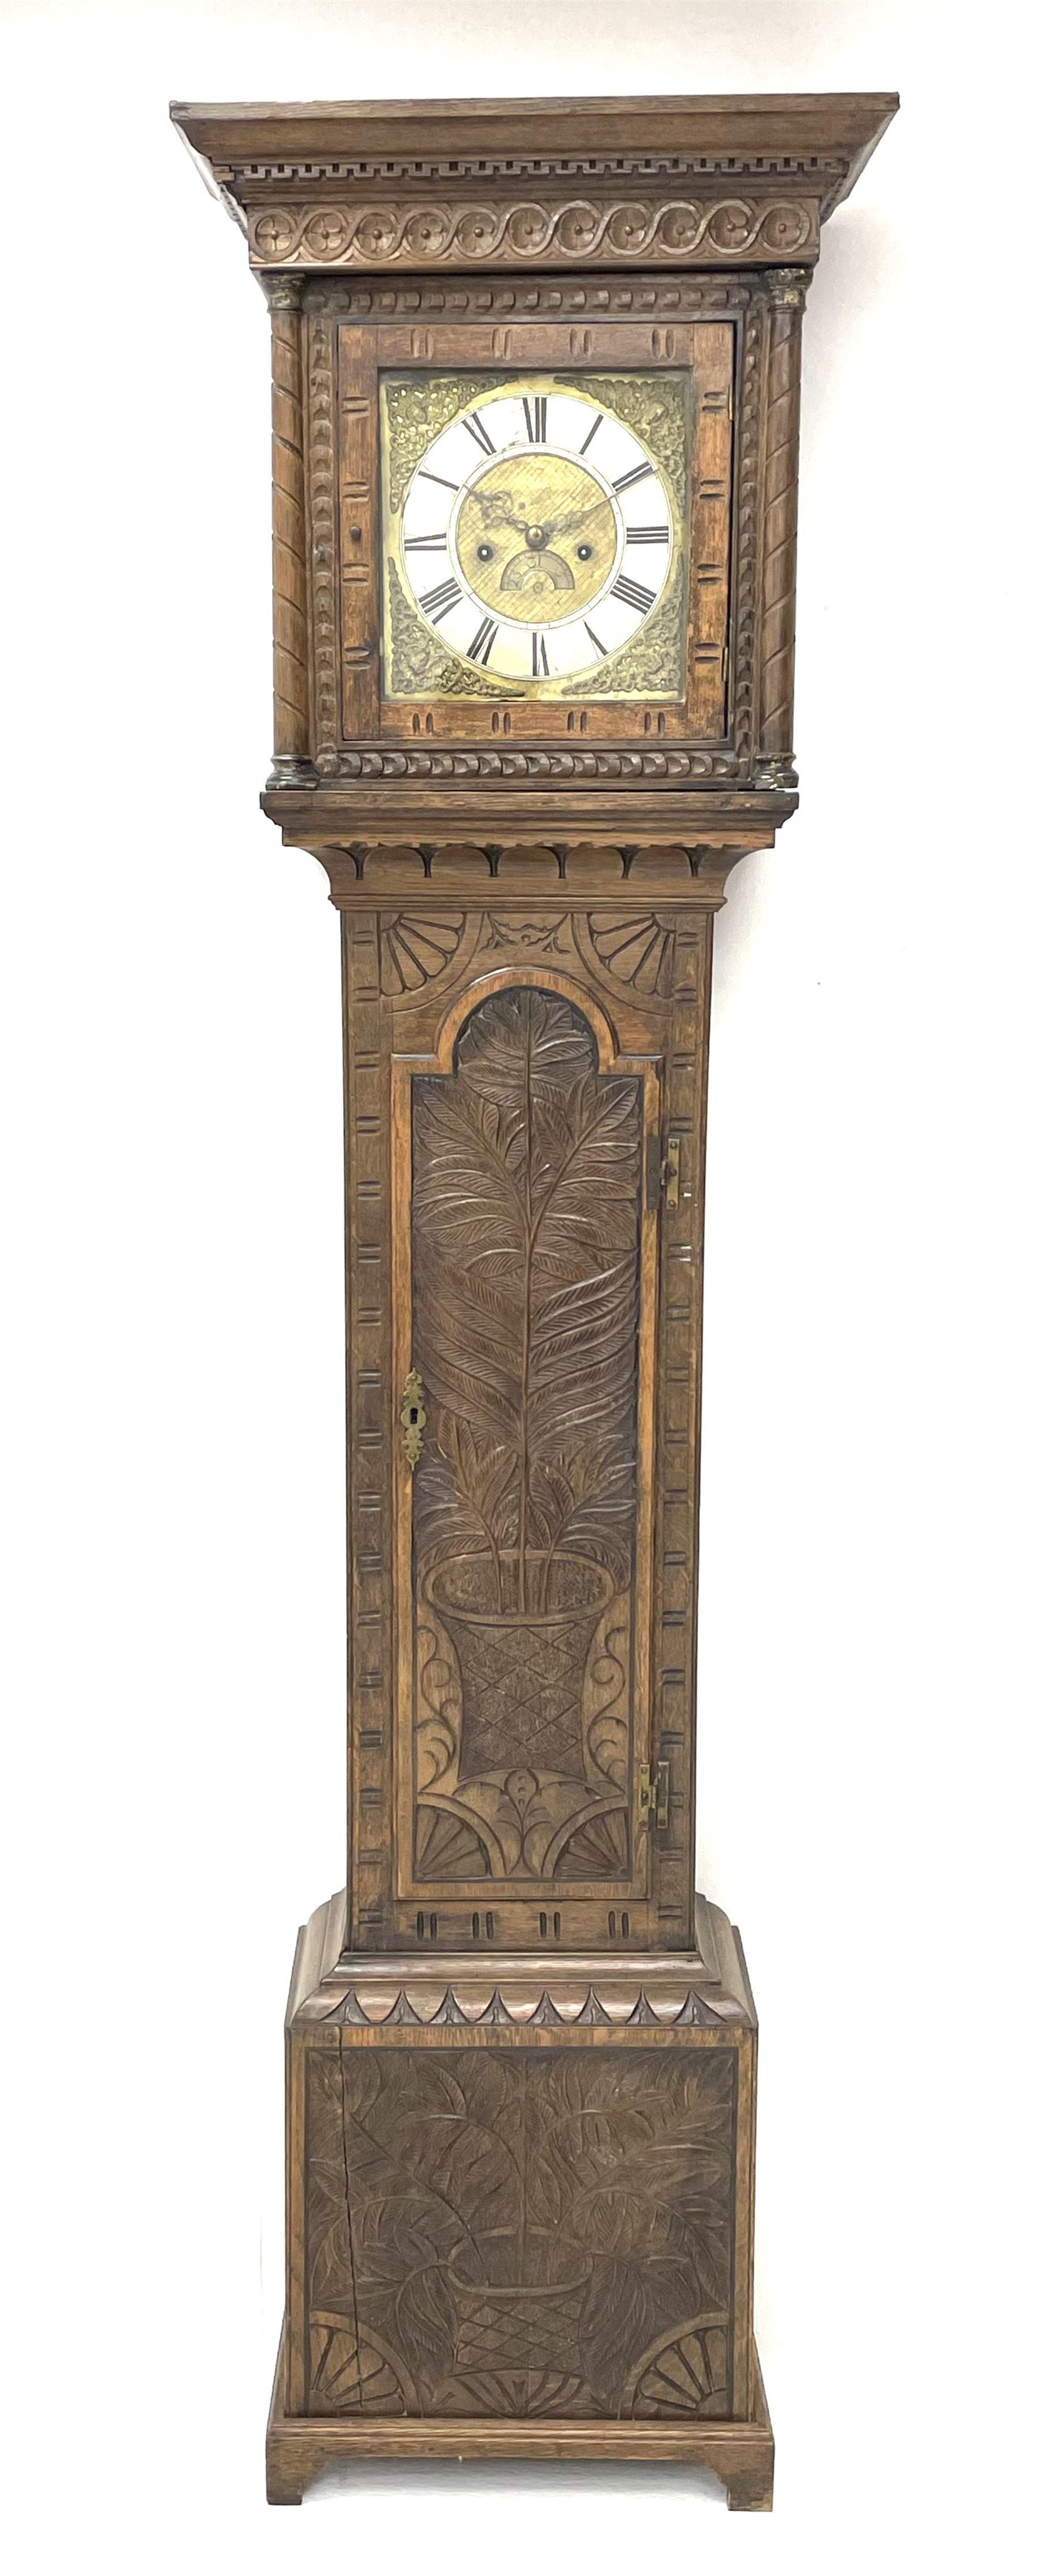 19th century carved oak longcase clock